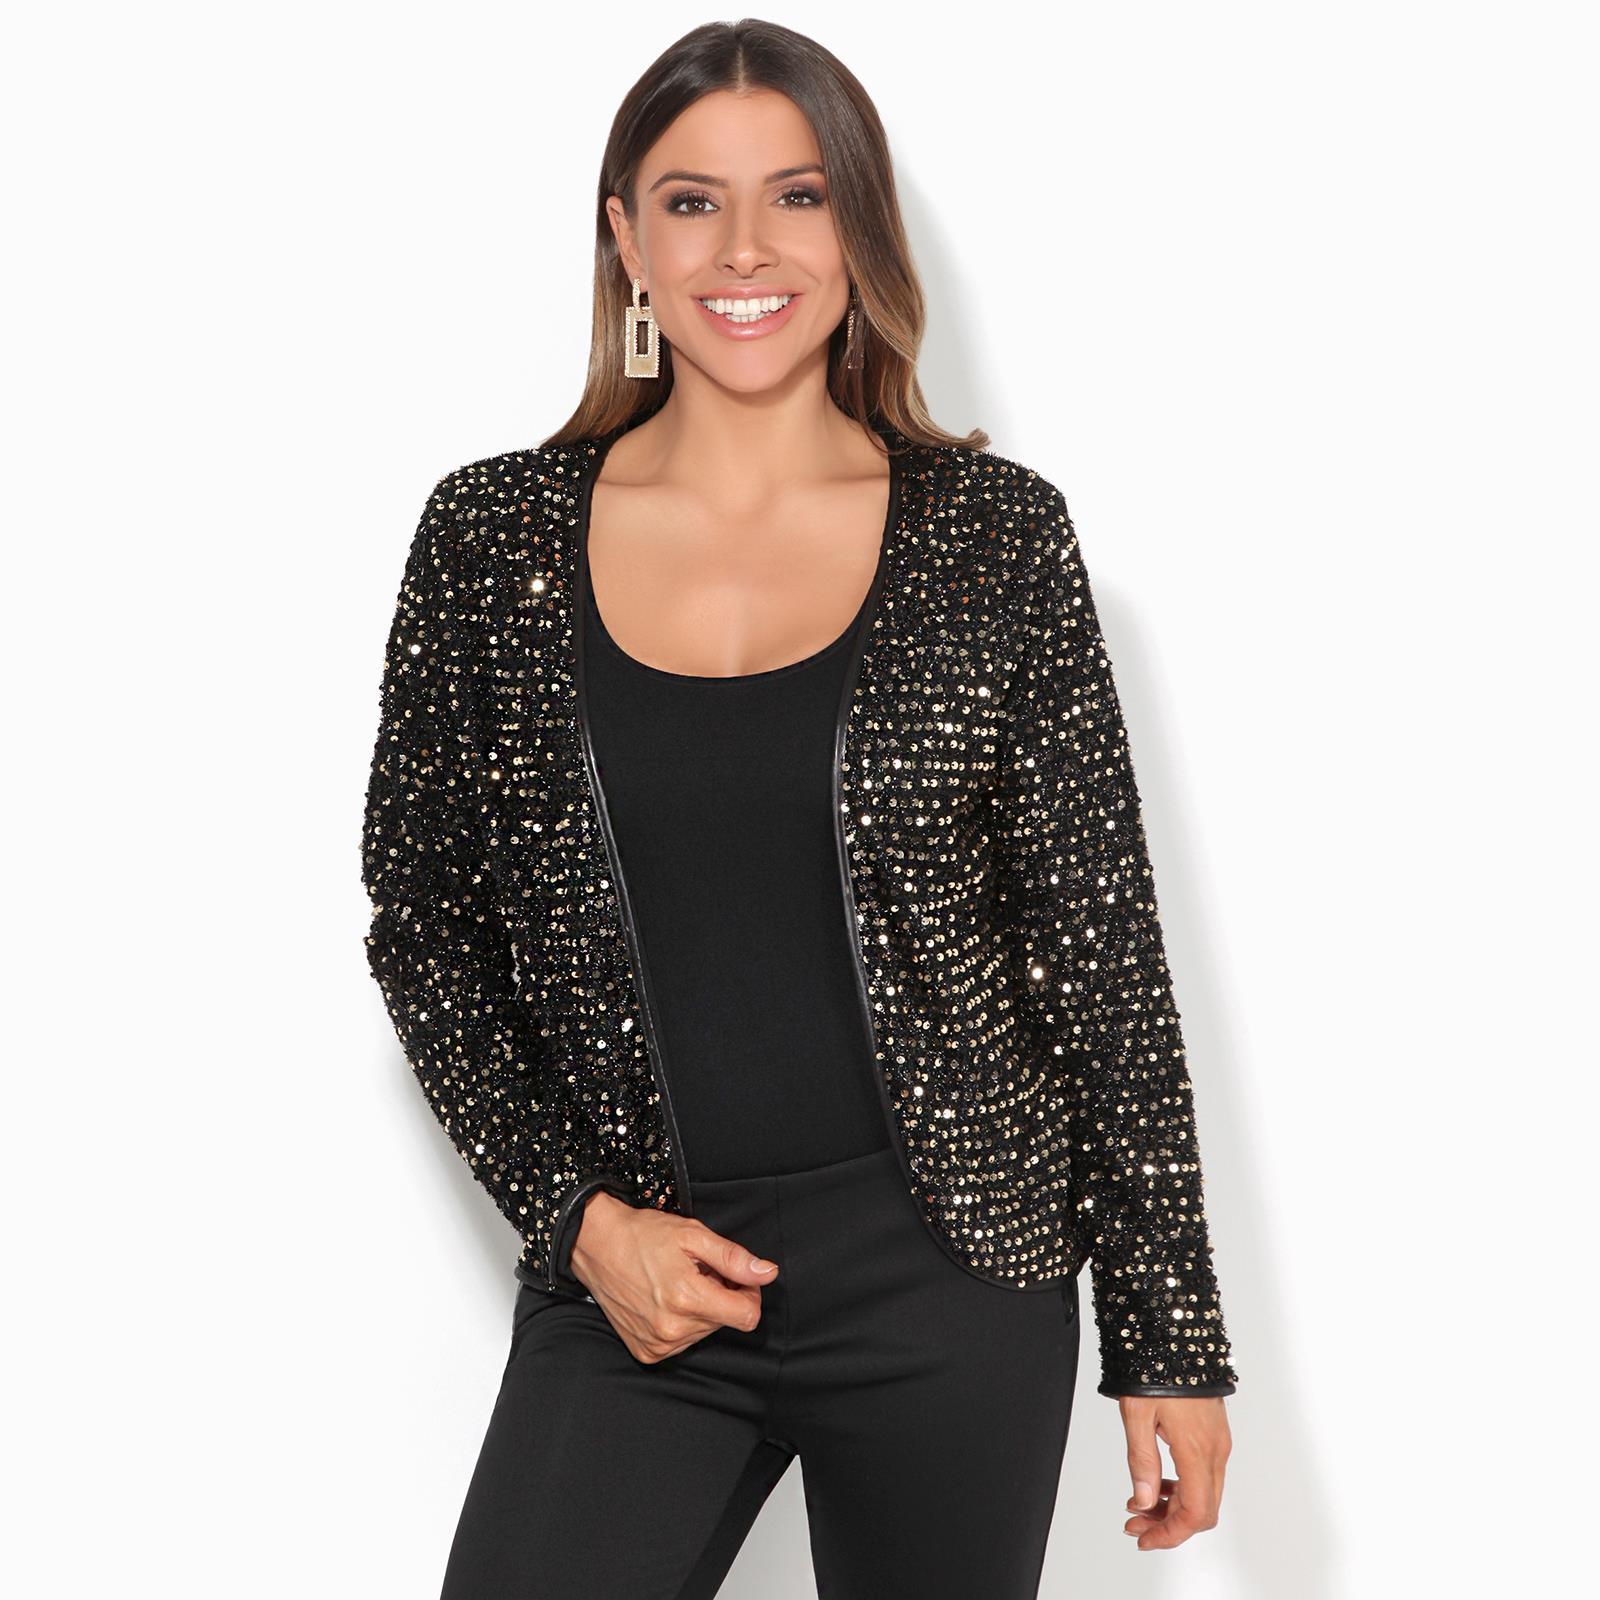 Womens-Sequin-Shrug-Bolero-Cropped-Top-Jacket-Blazer-Party-Evening-Coat thumbnail 9